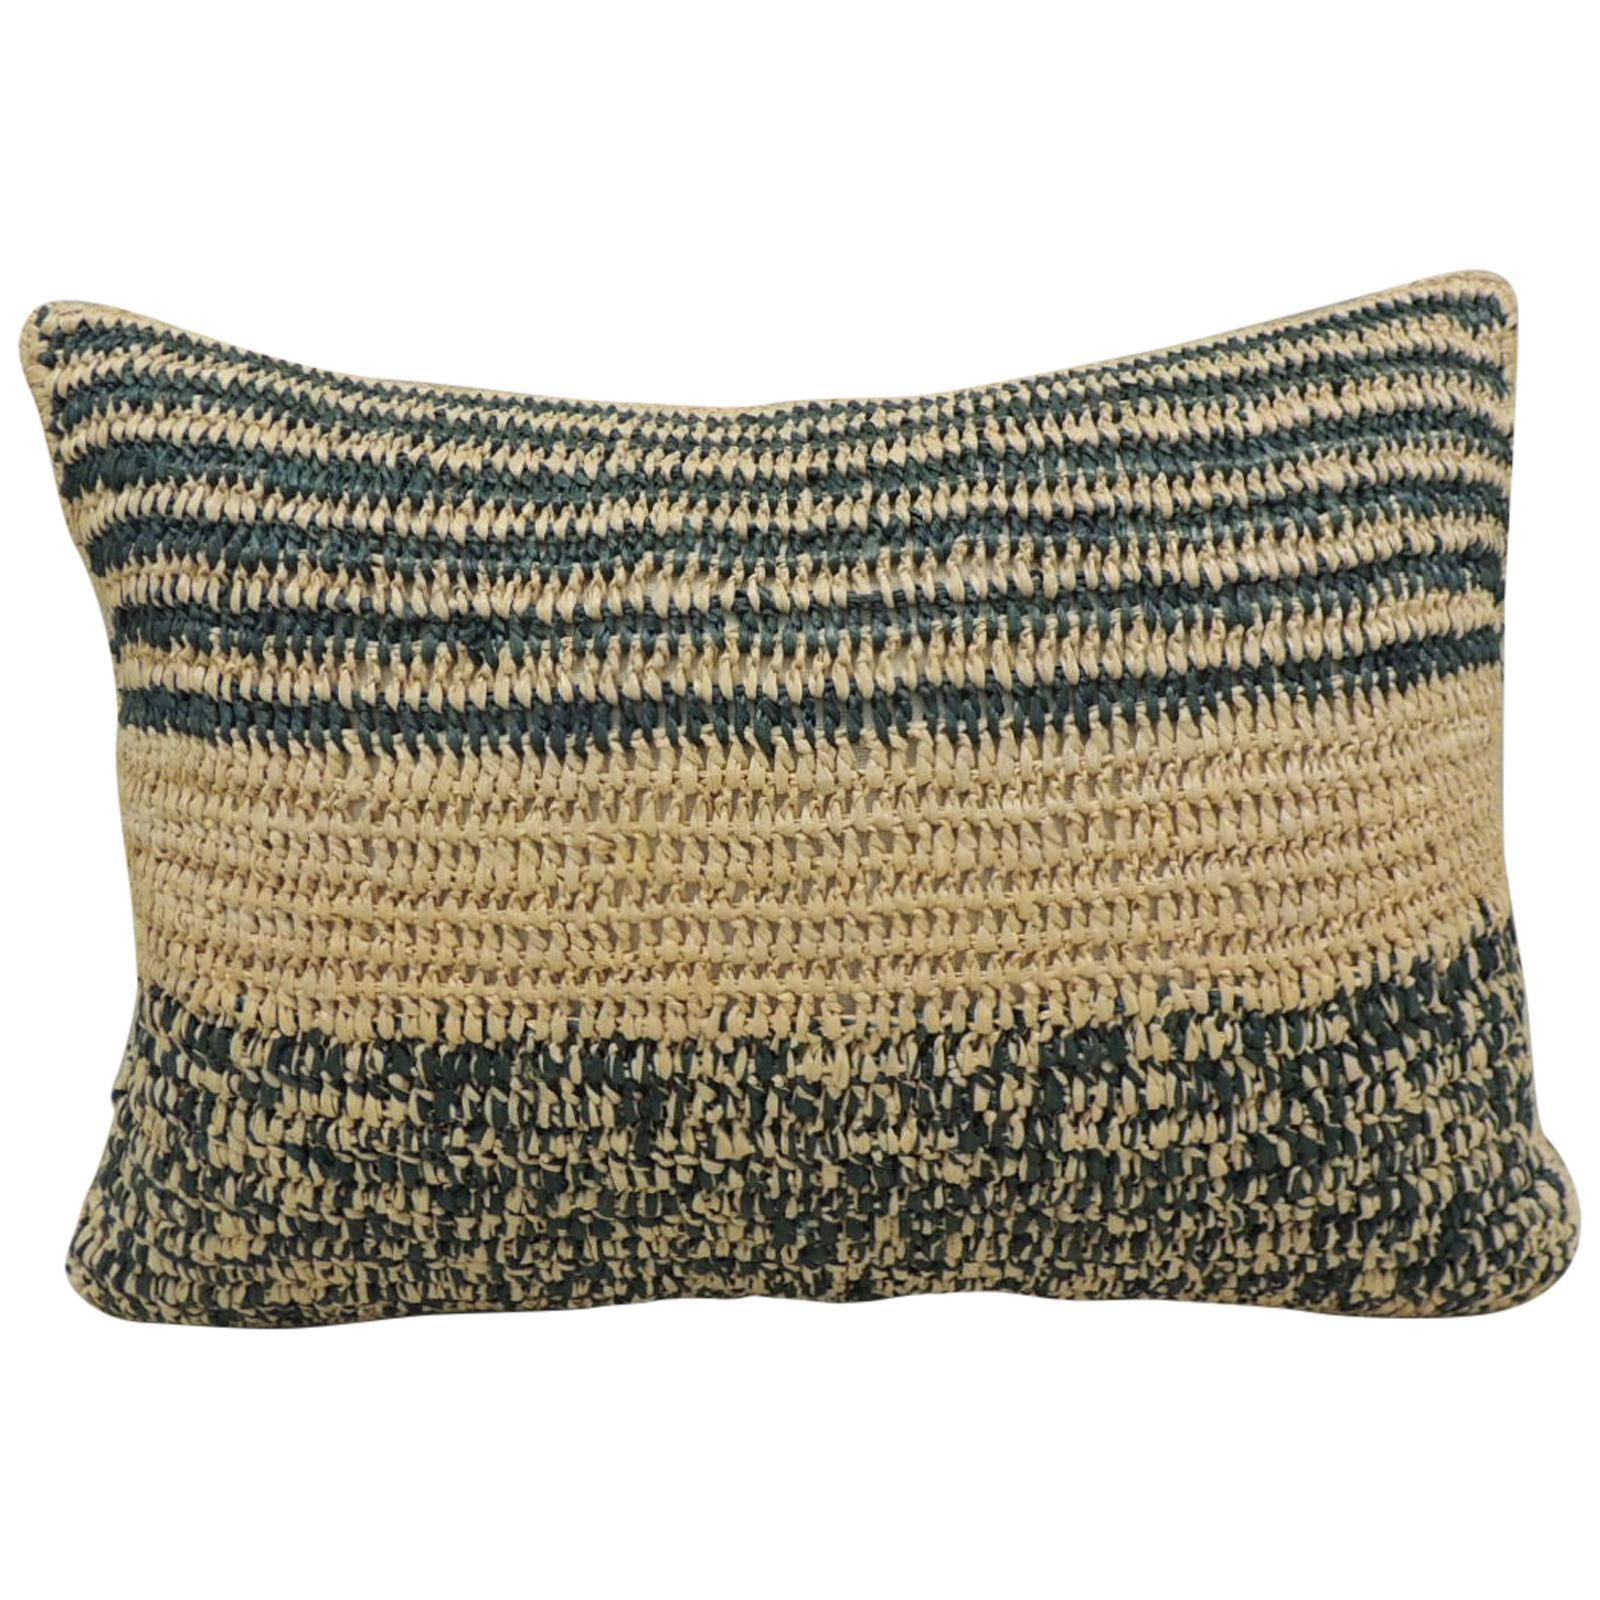 Modern Woven Green and Natural Raffia Lumbar Decorative Pillow